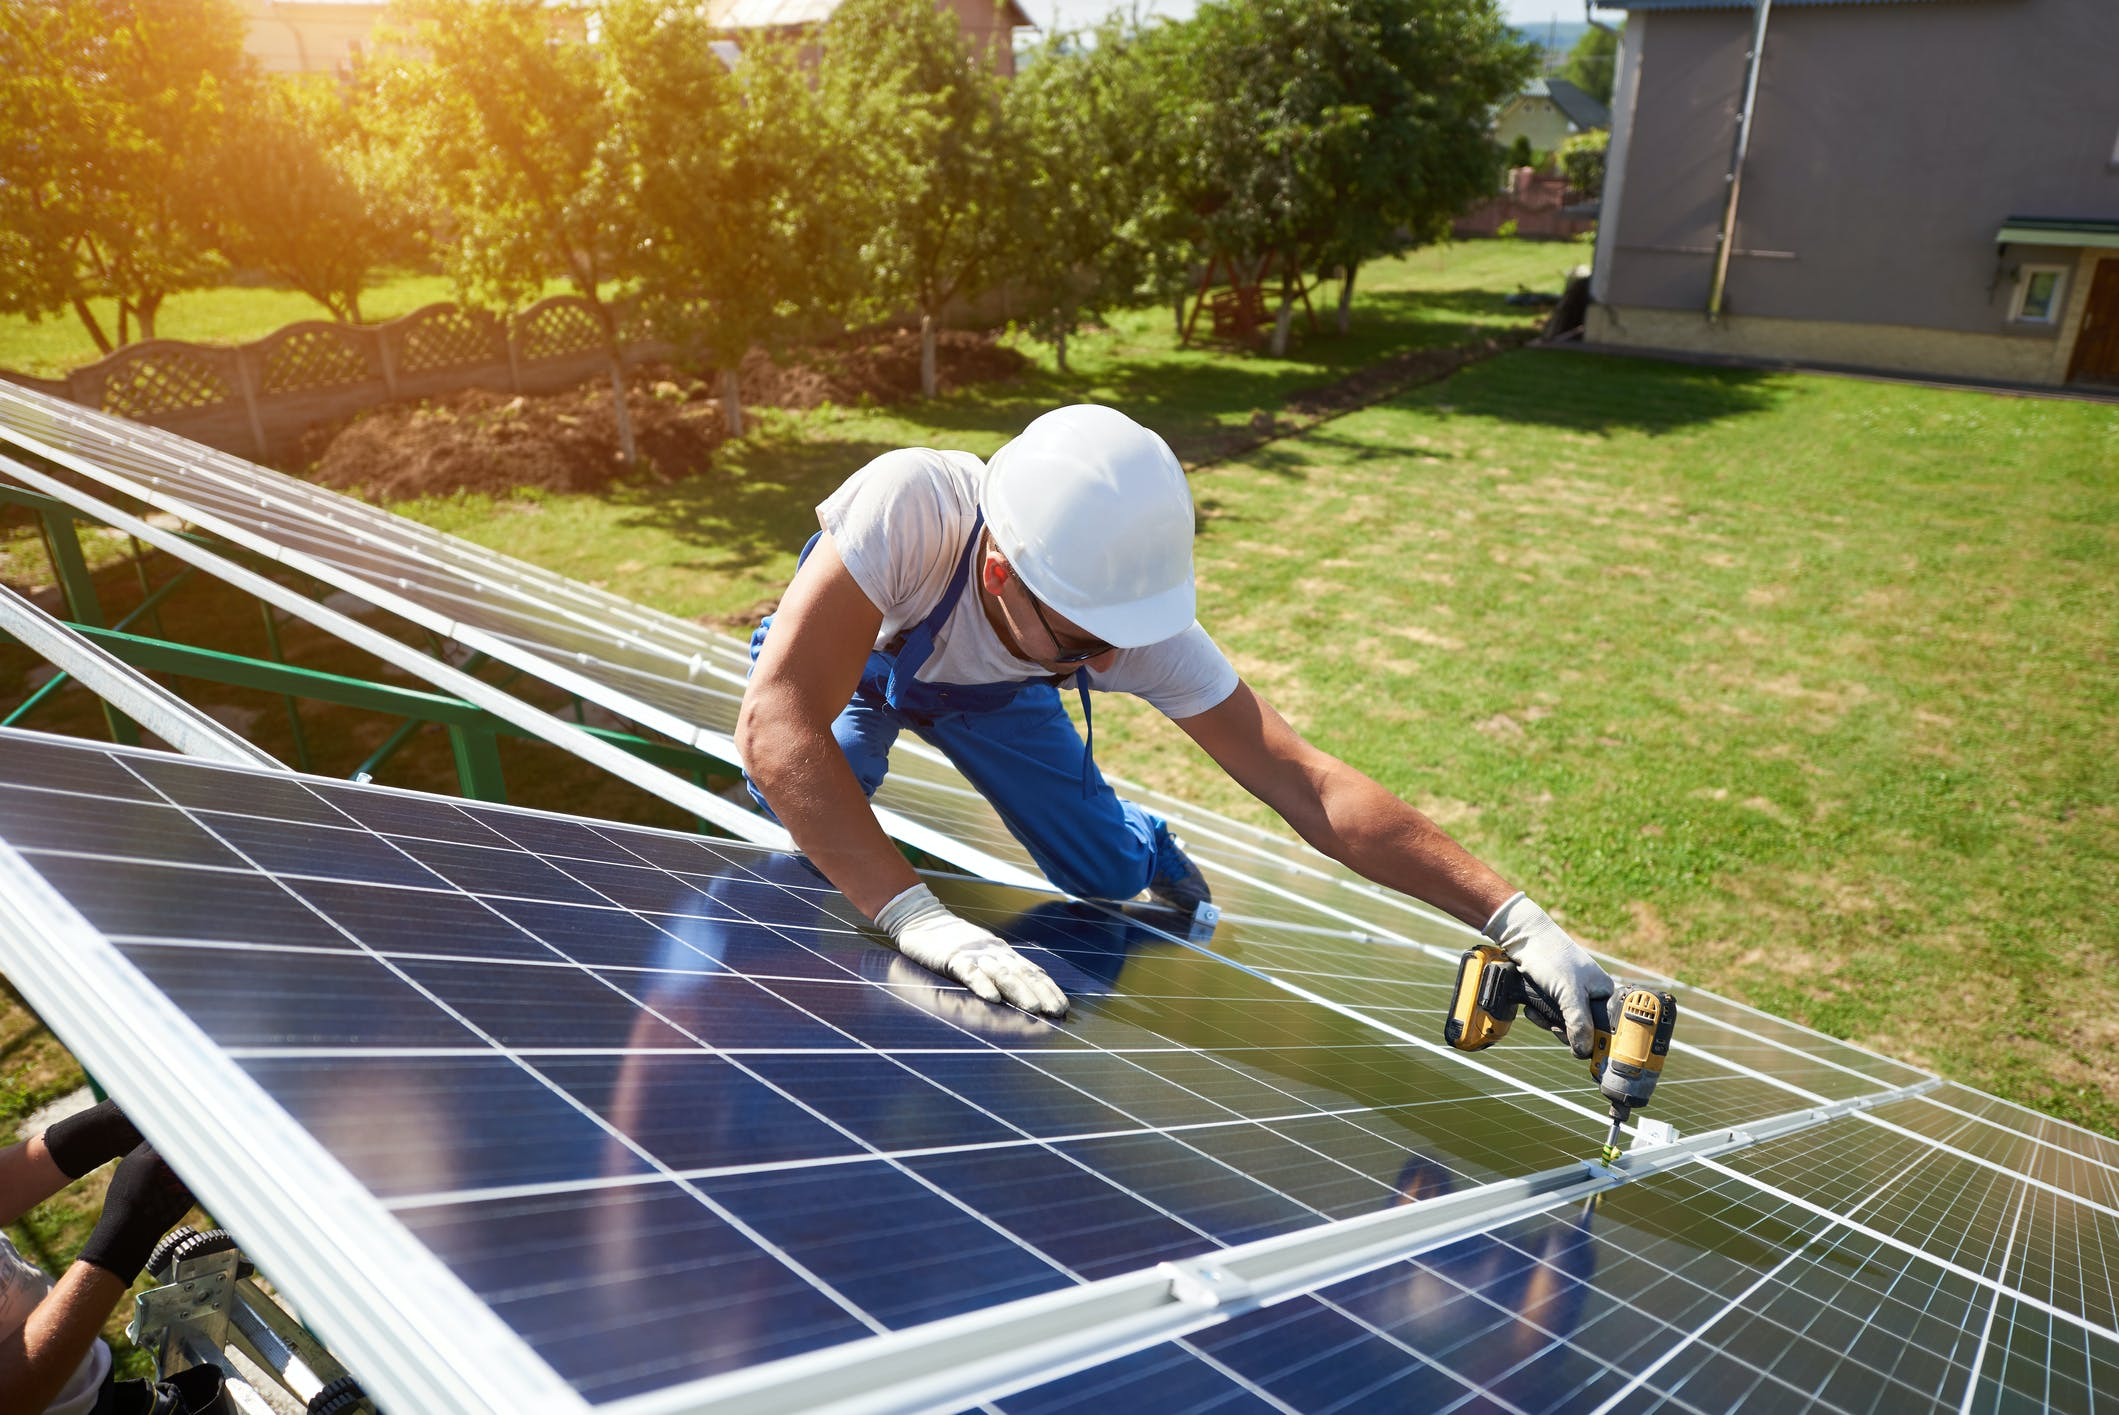 VITRONIC Photovoltaics